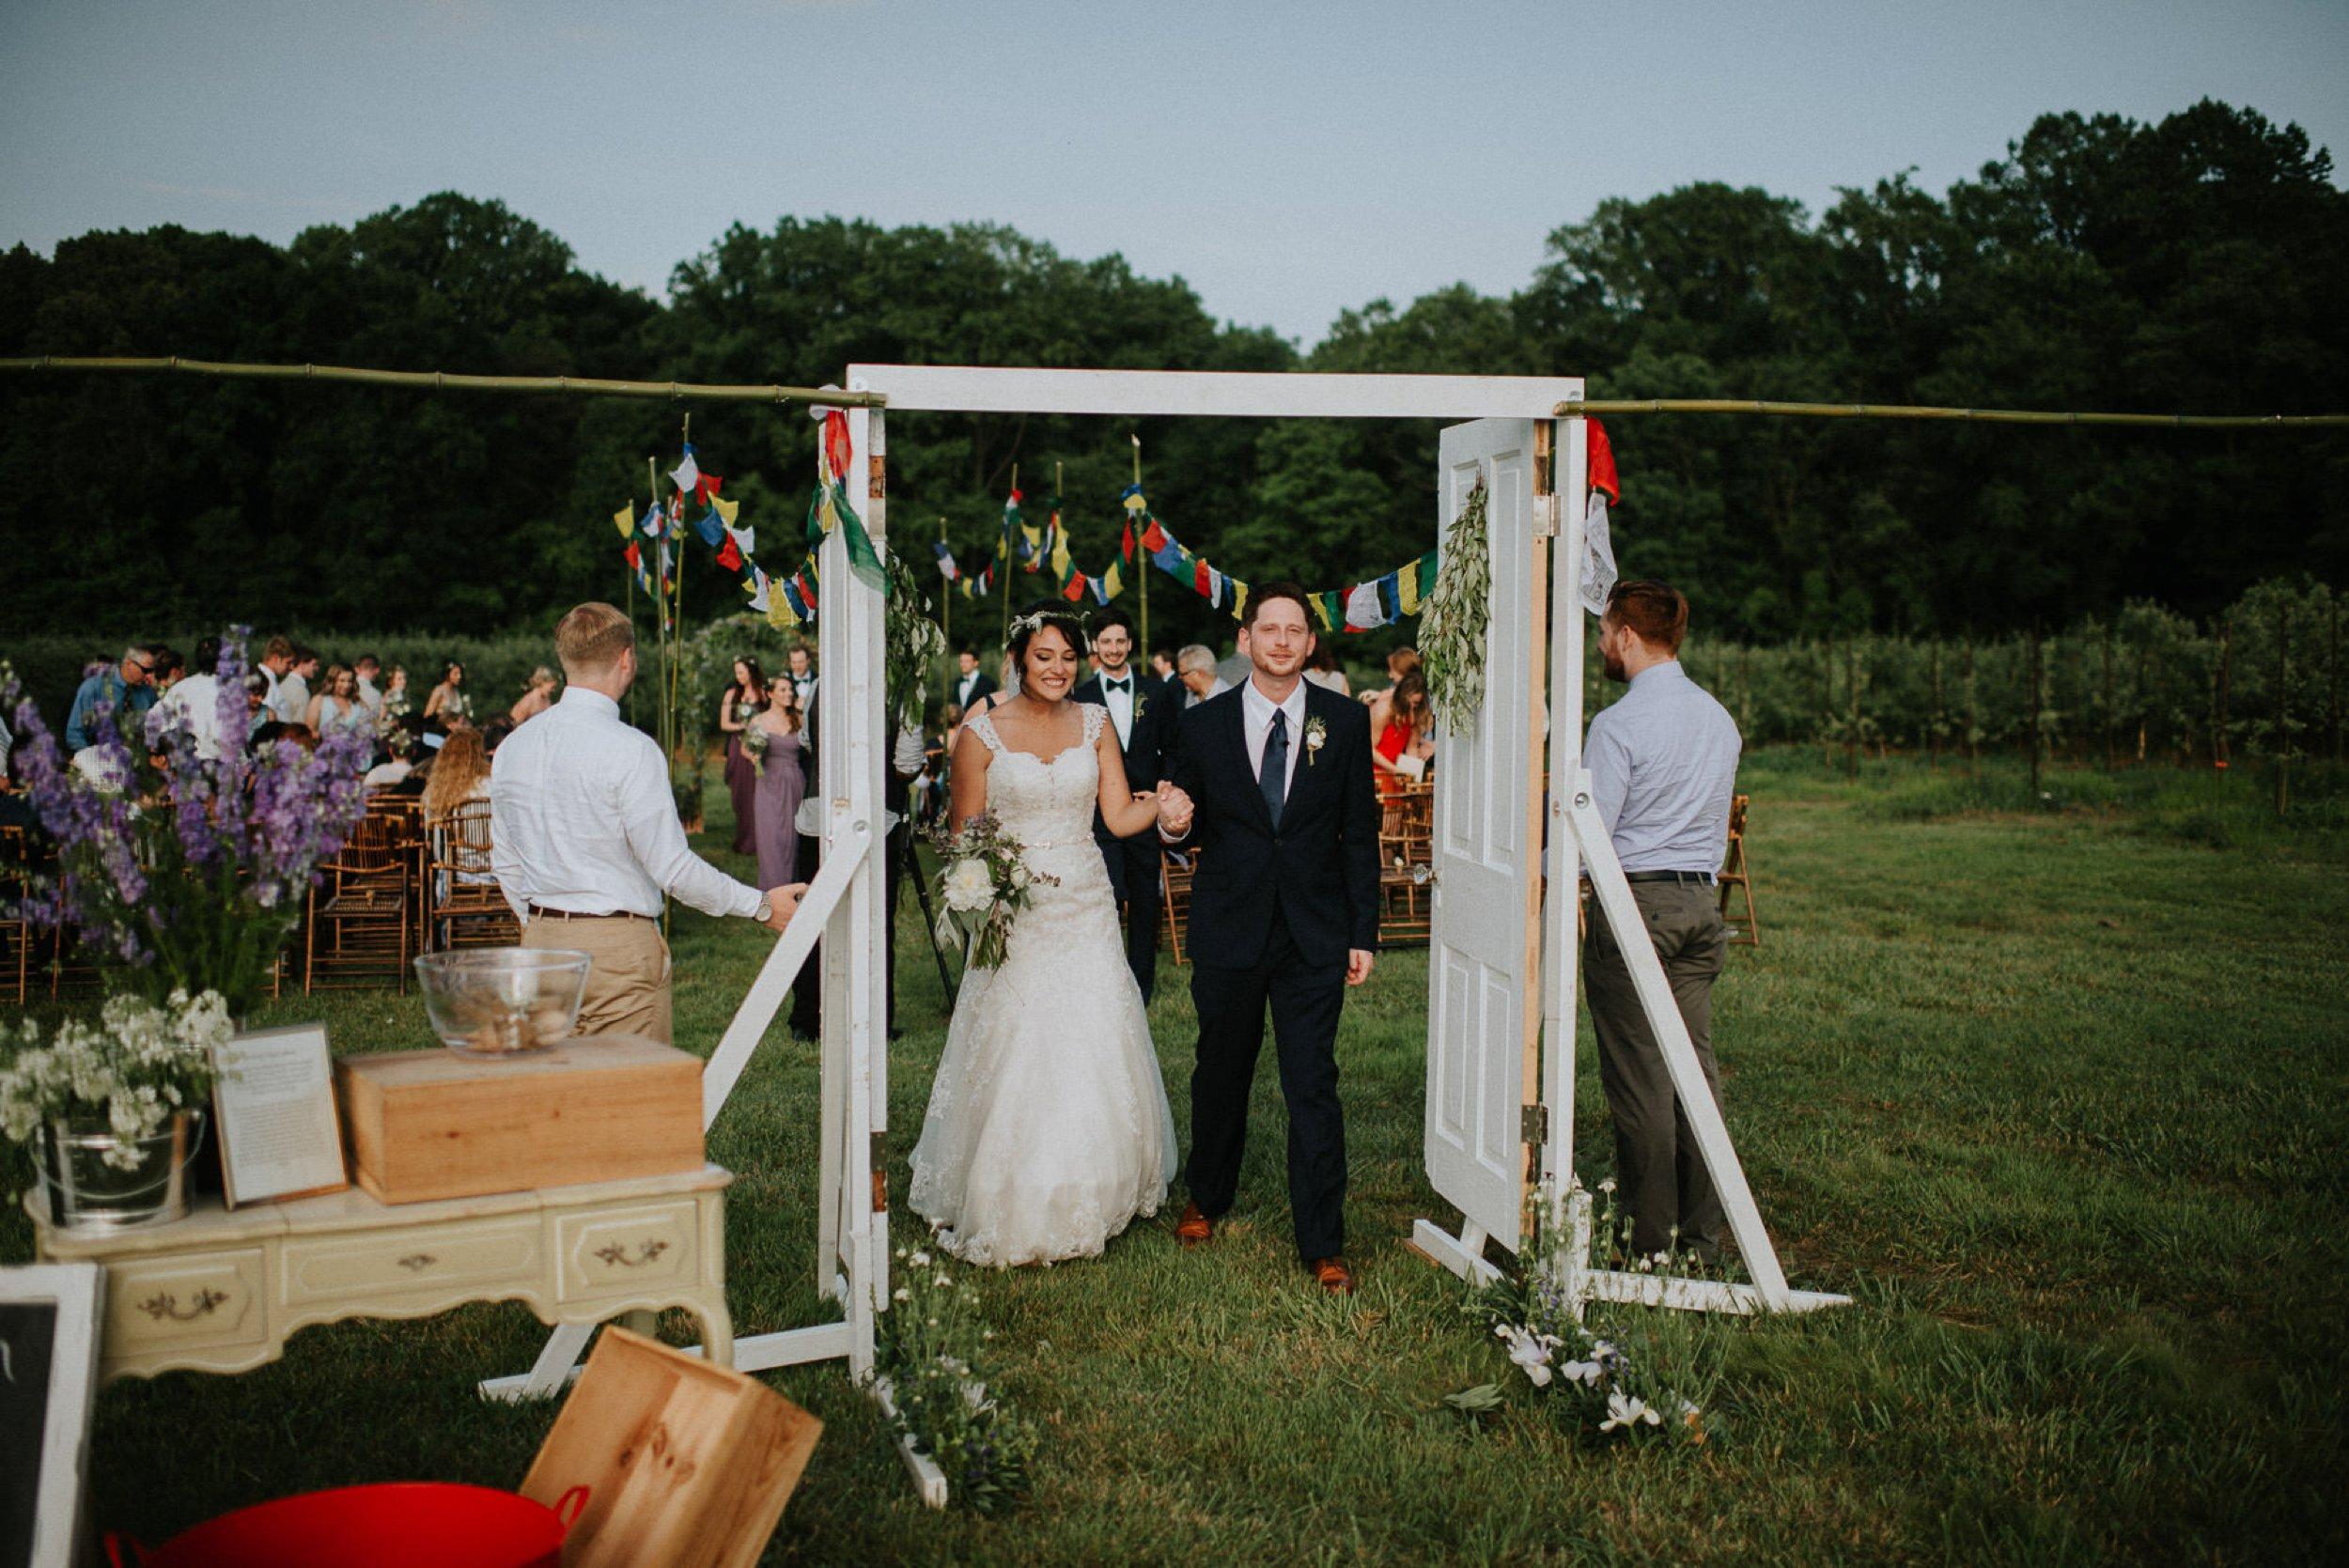 milburn_farms-wedding-45.jpg